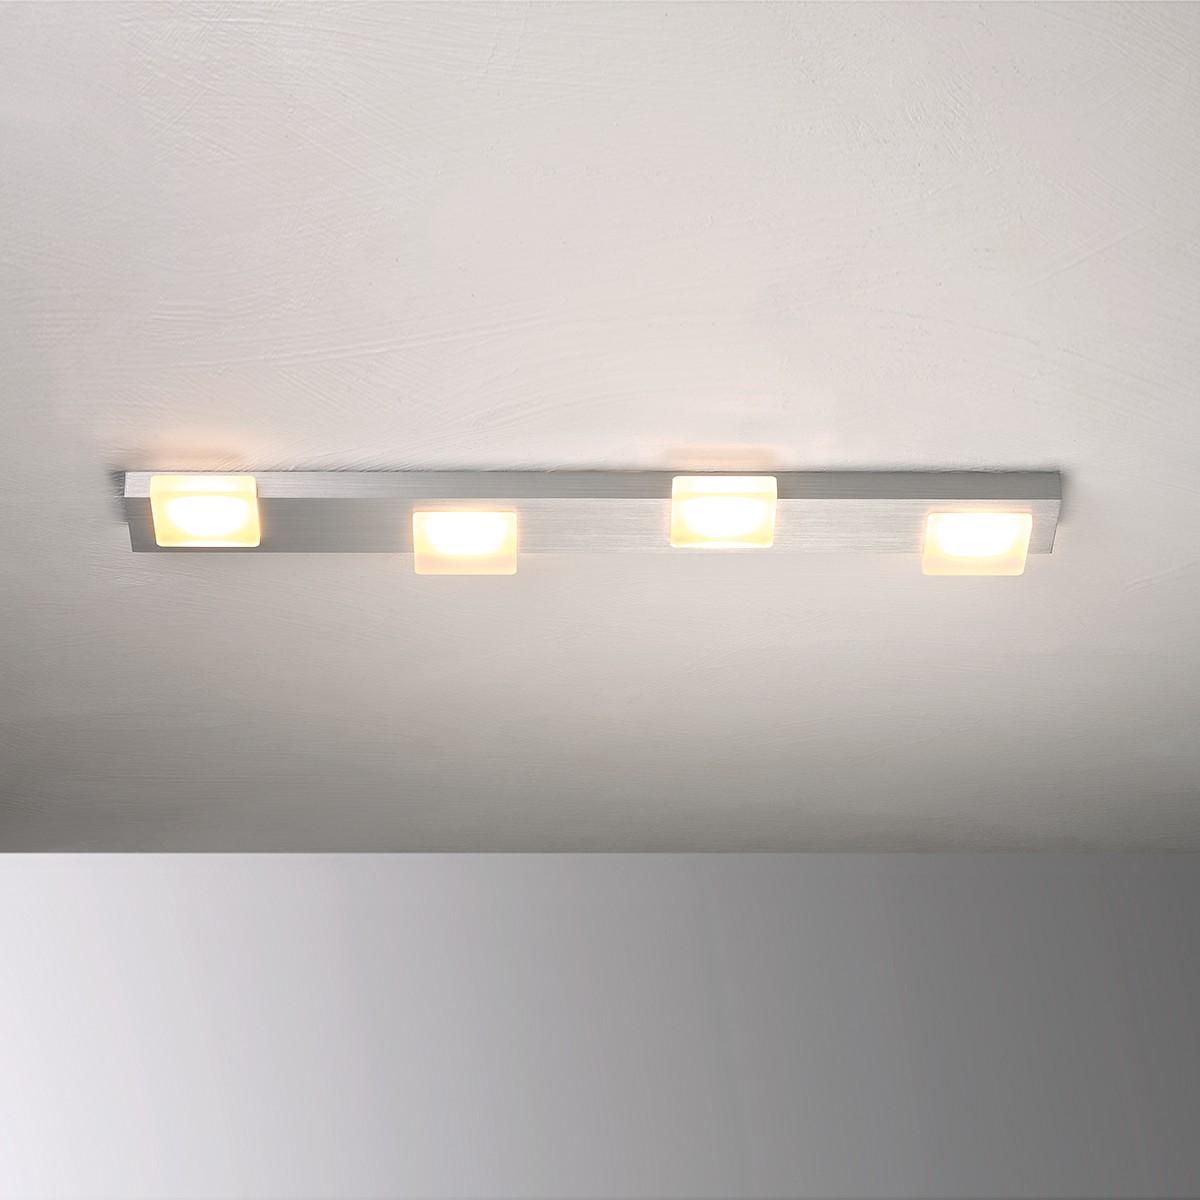 Bopp Lamina LED Deckenleuchte 4-flg., Aluminium geschliffen